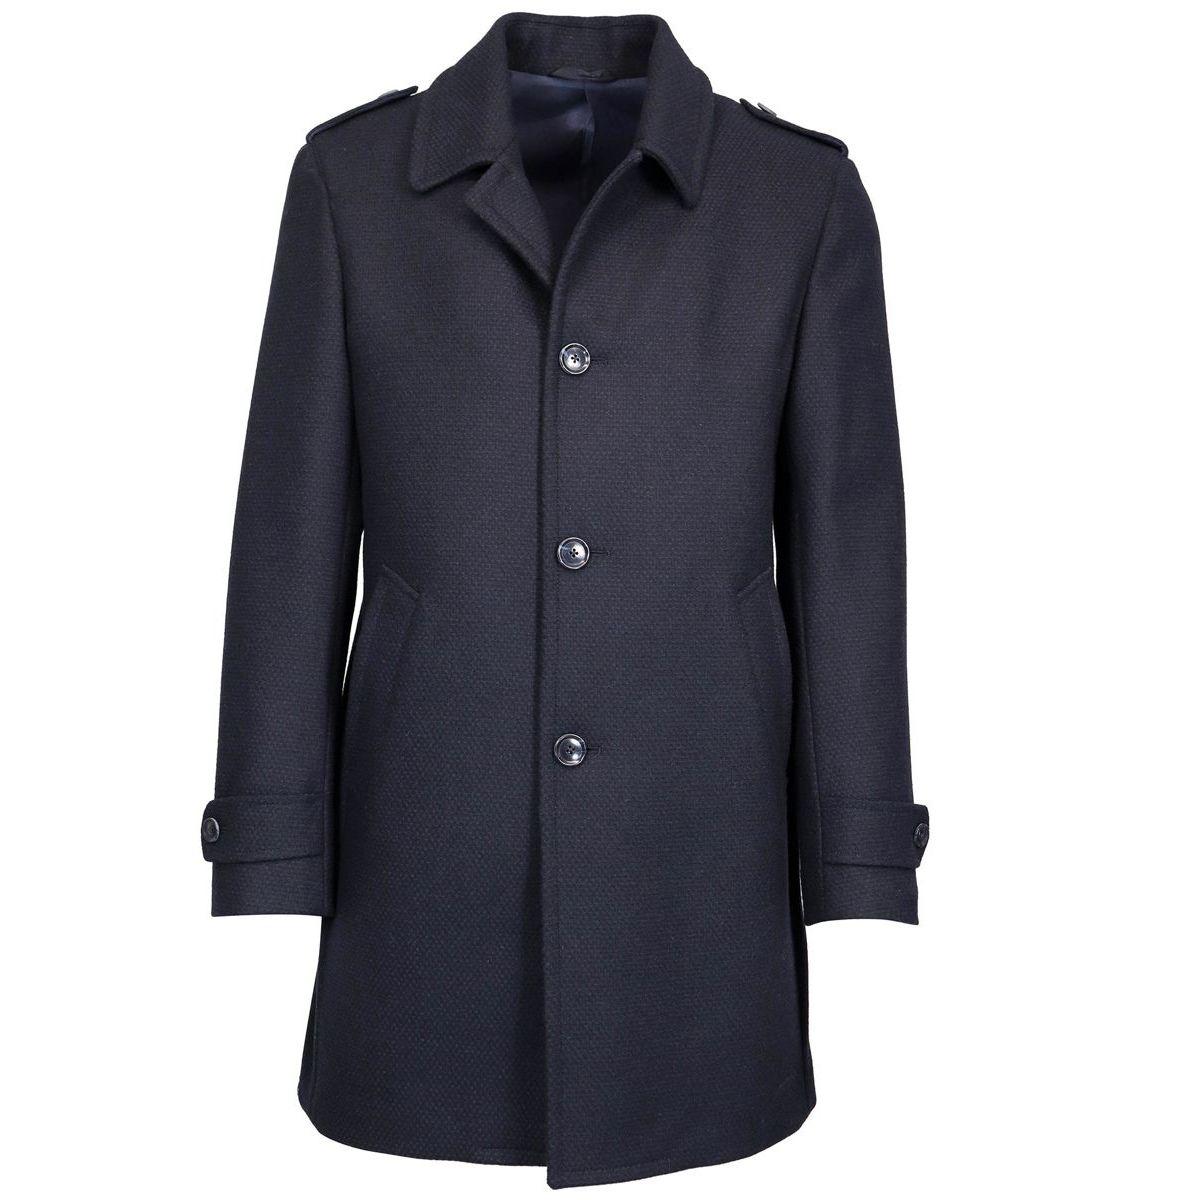 3 button wool blend coat Navy L.B.M. 1911